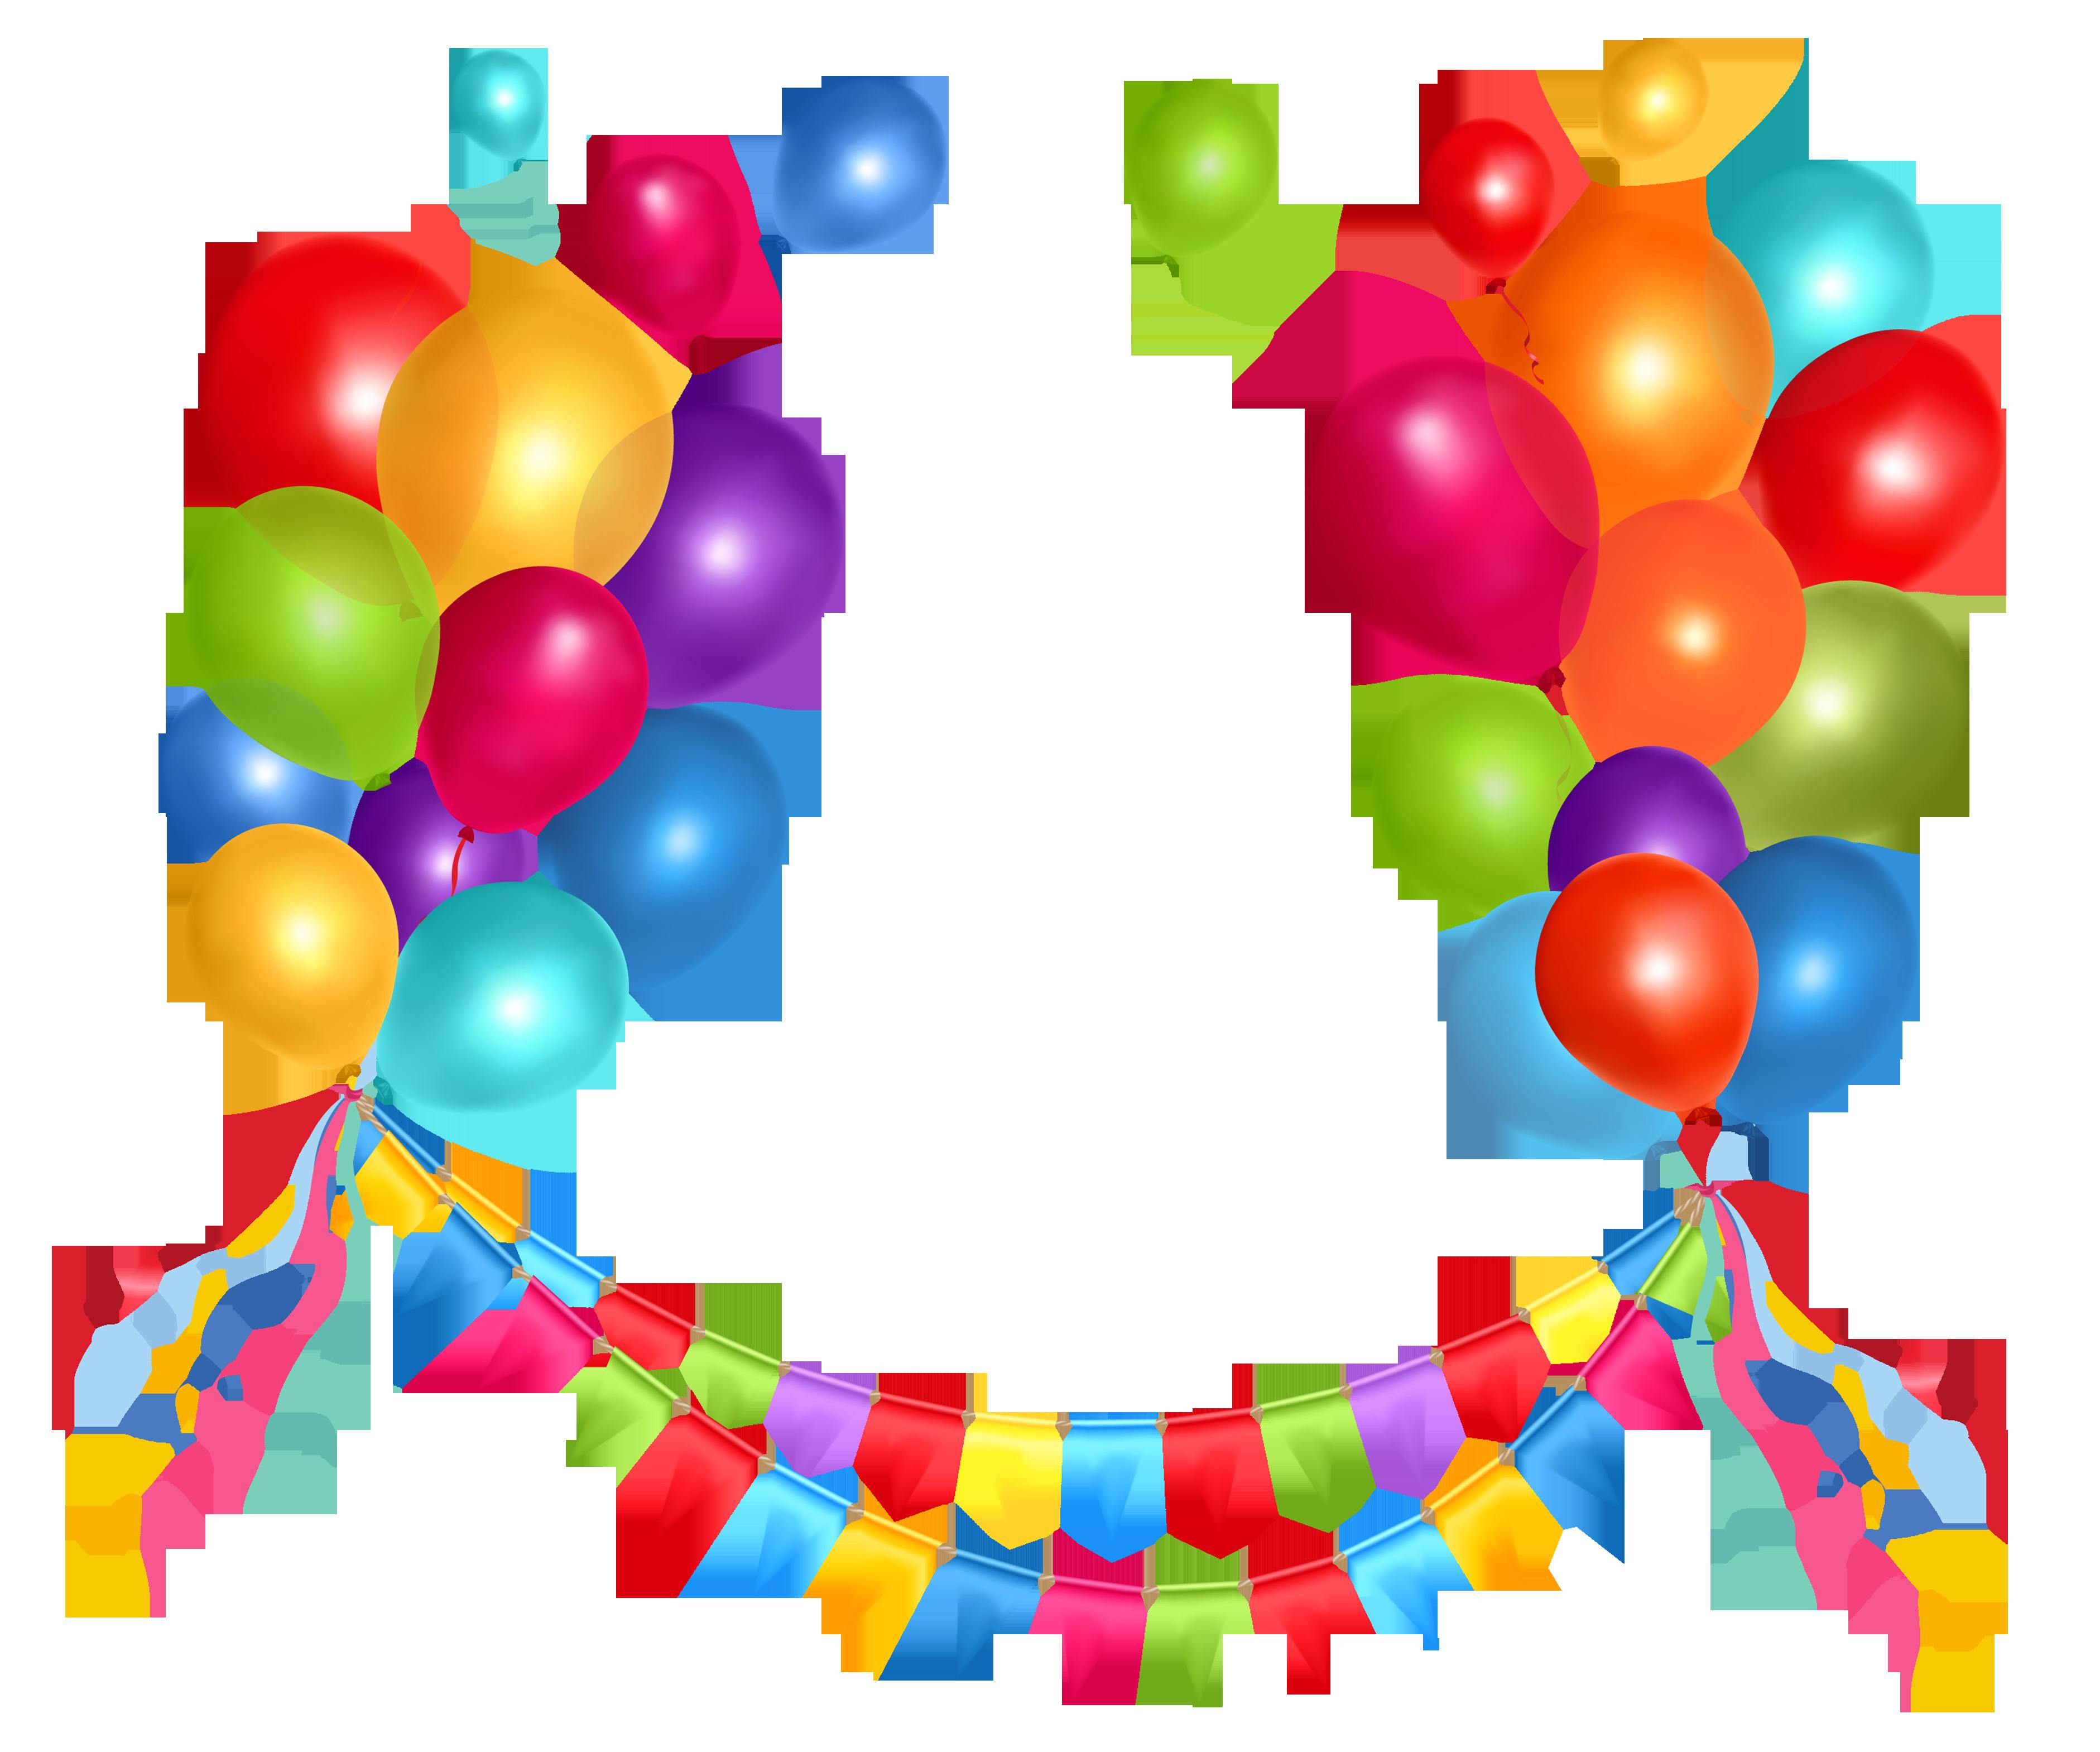 Transparent streamer and balloons. Balloon clipart party balloon